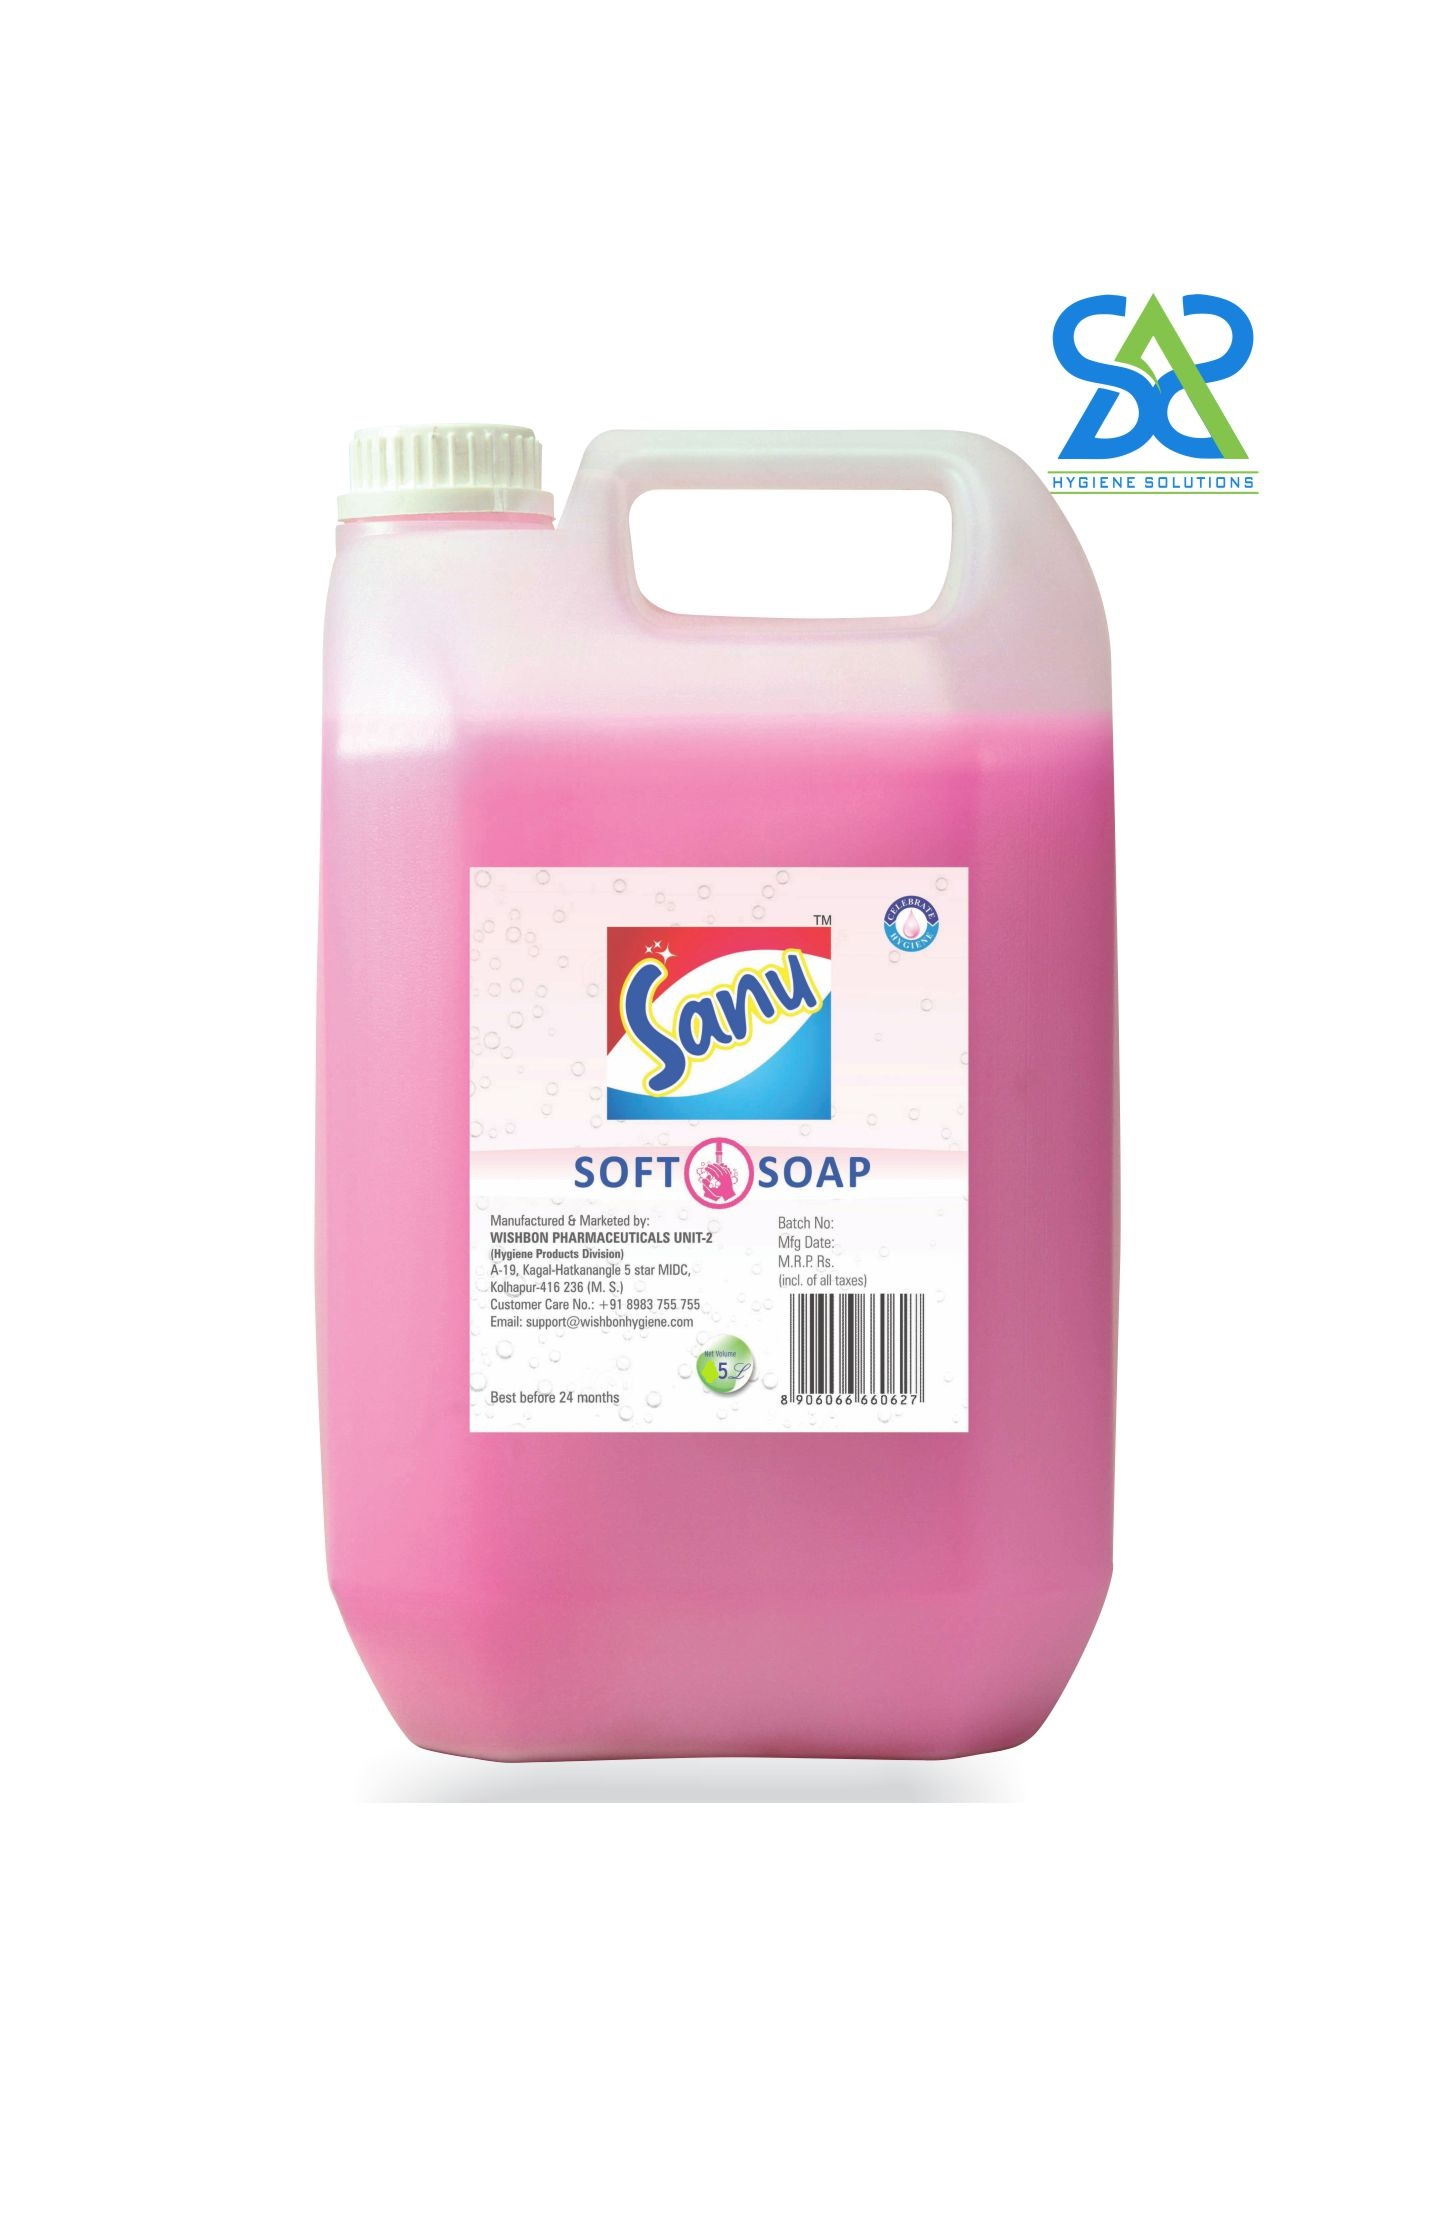 Sanu Soft Soap Handwash, 5 Litres - Rose